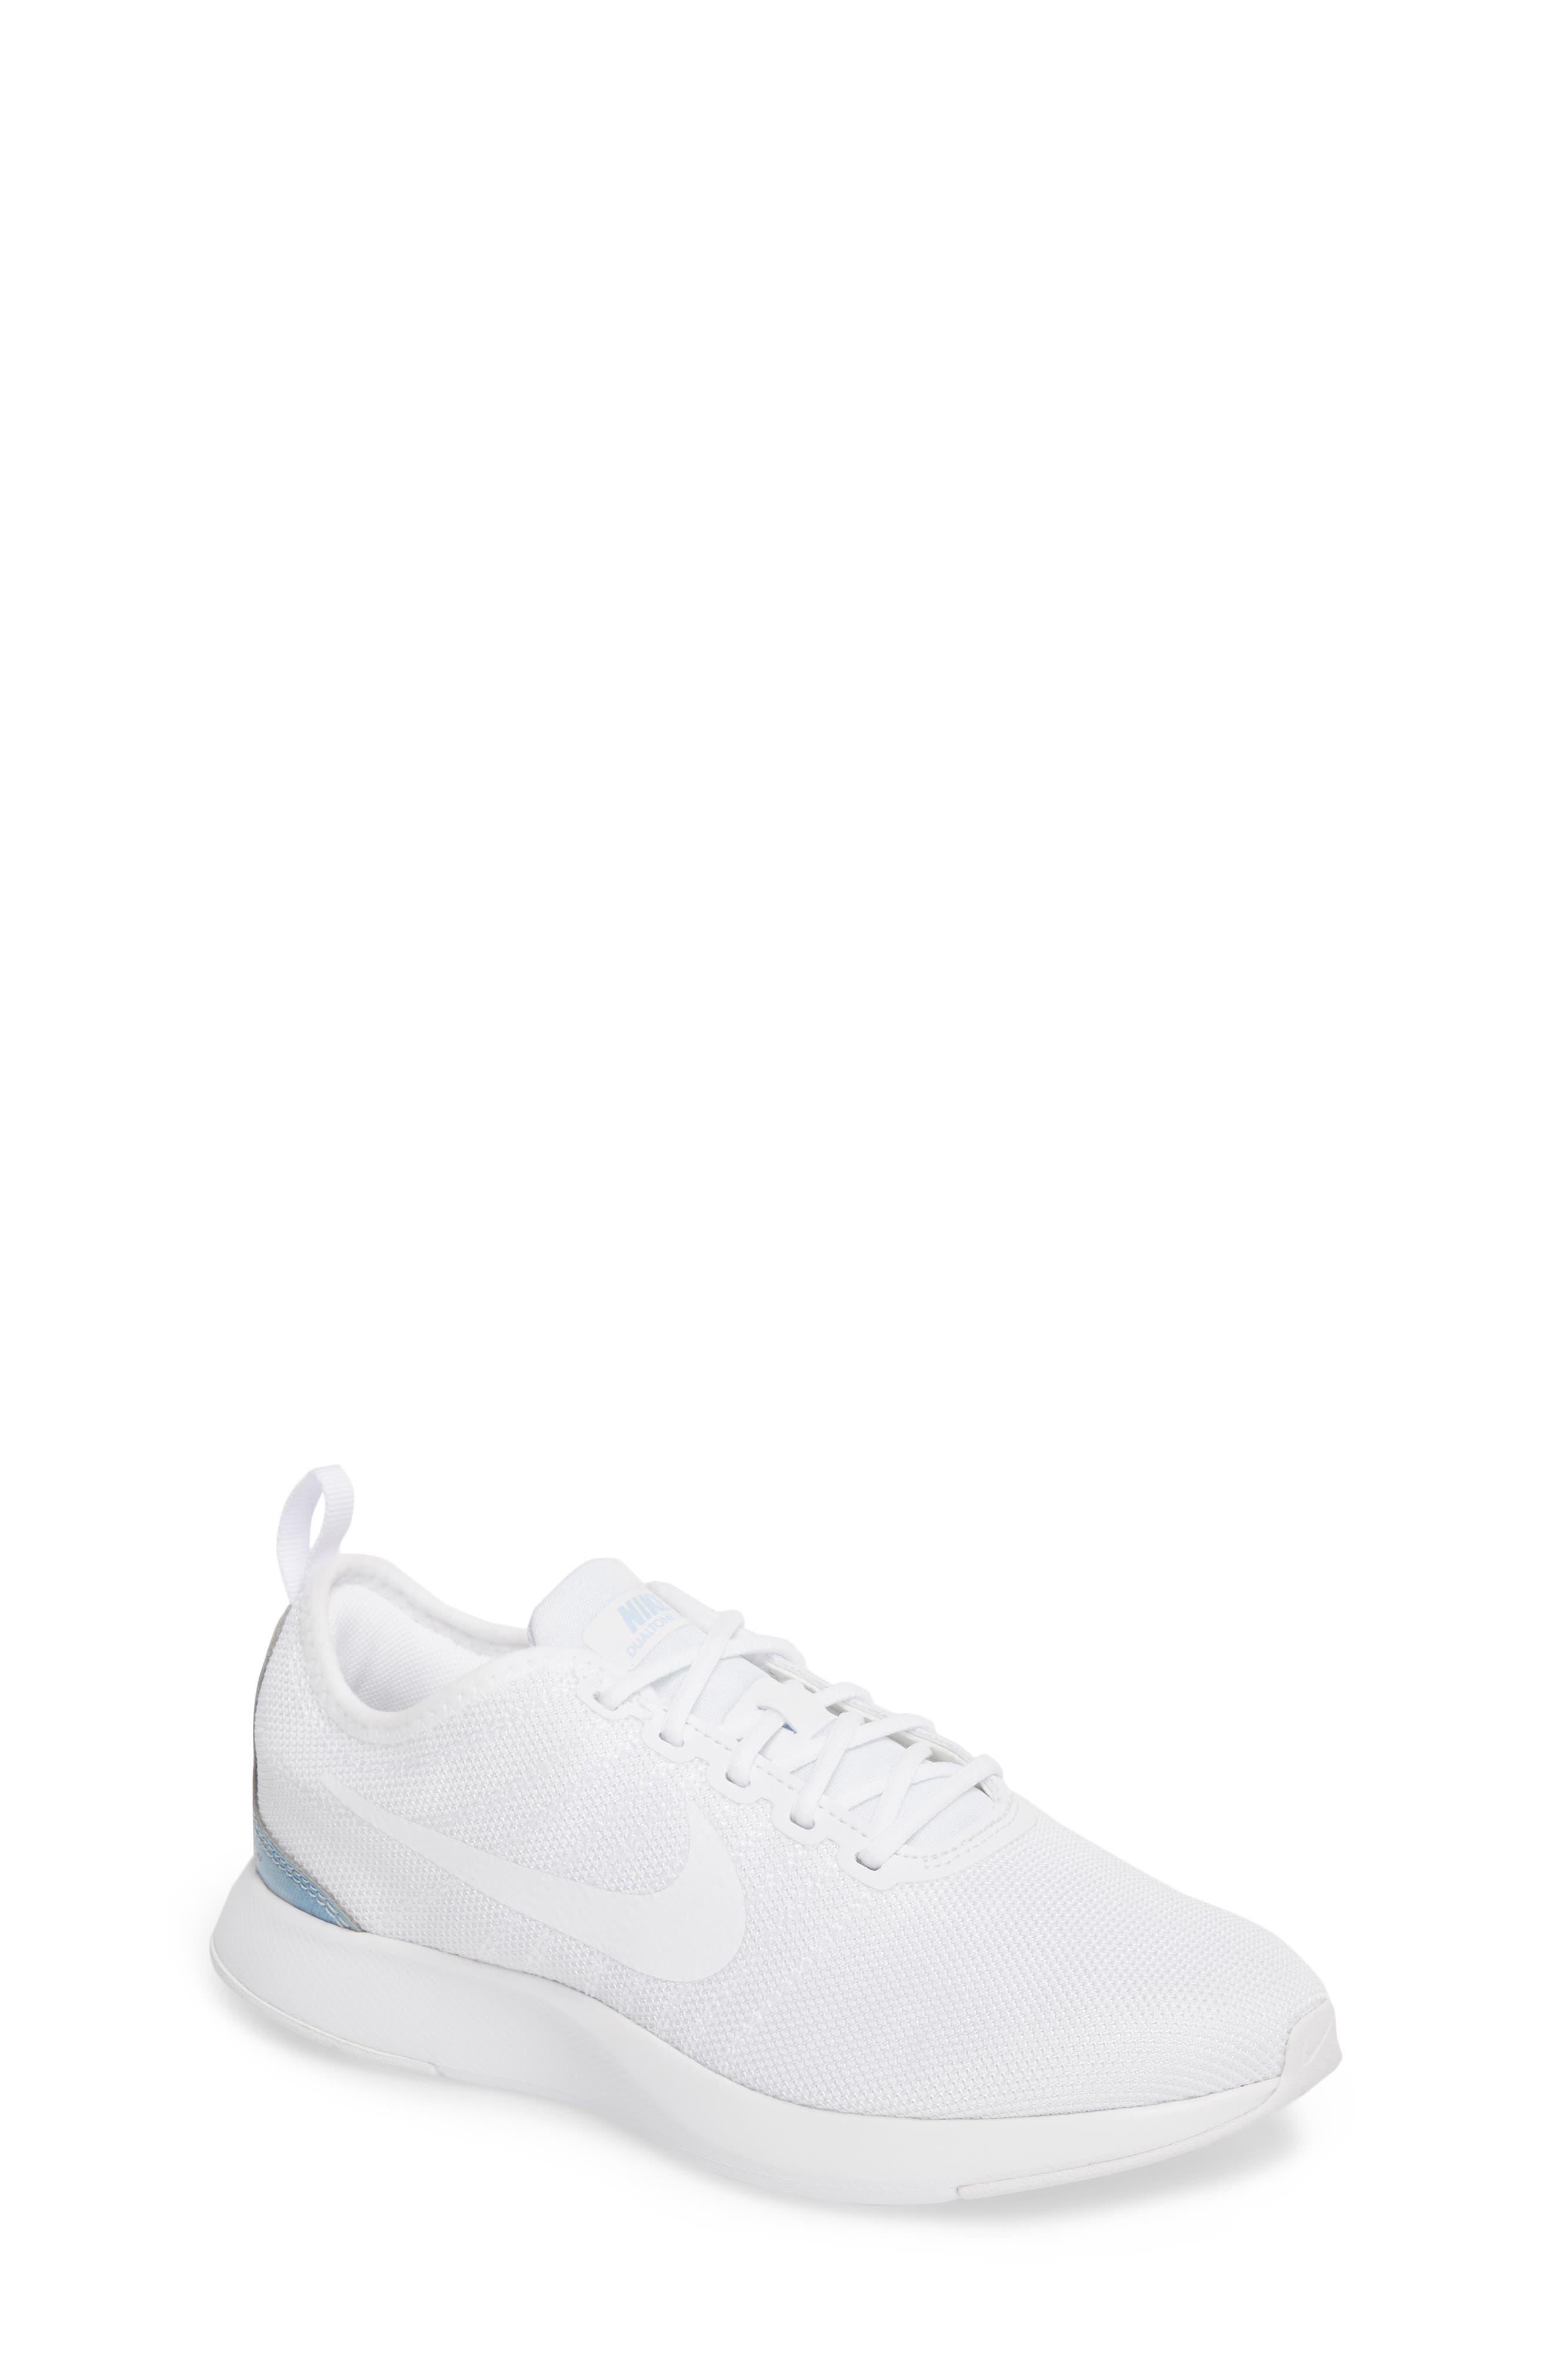 Dualtone Racer GS Sneaker,                             Main thumbnail 4, color,